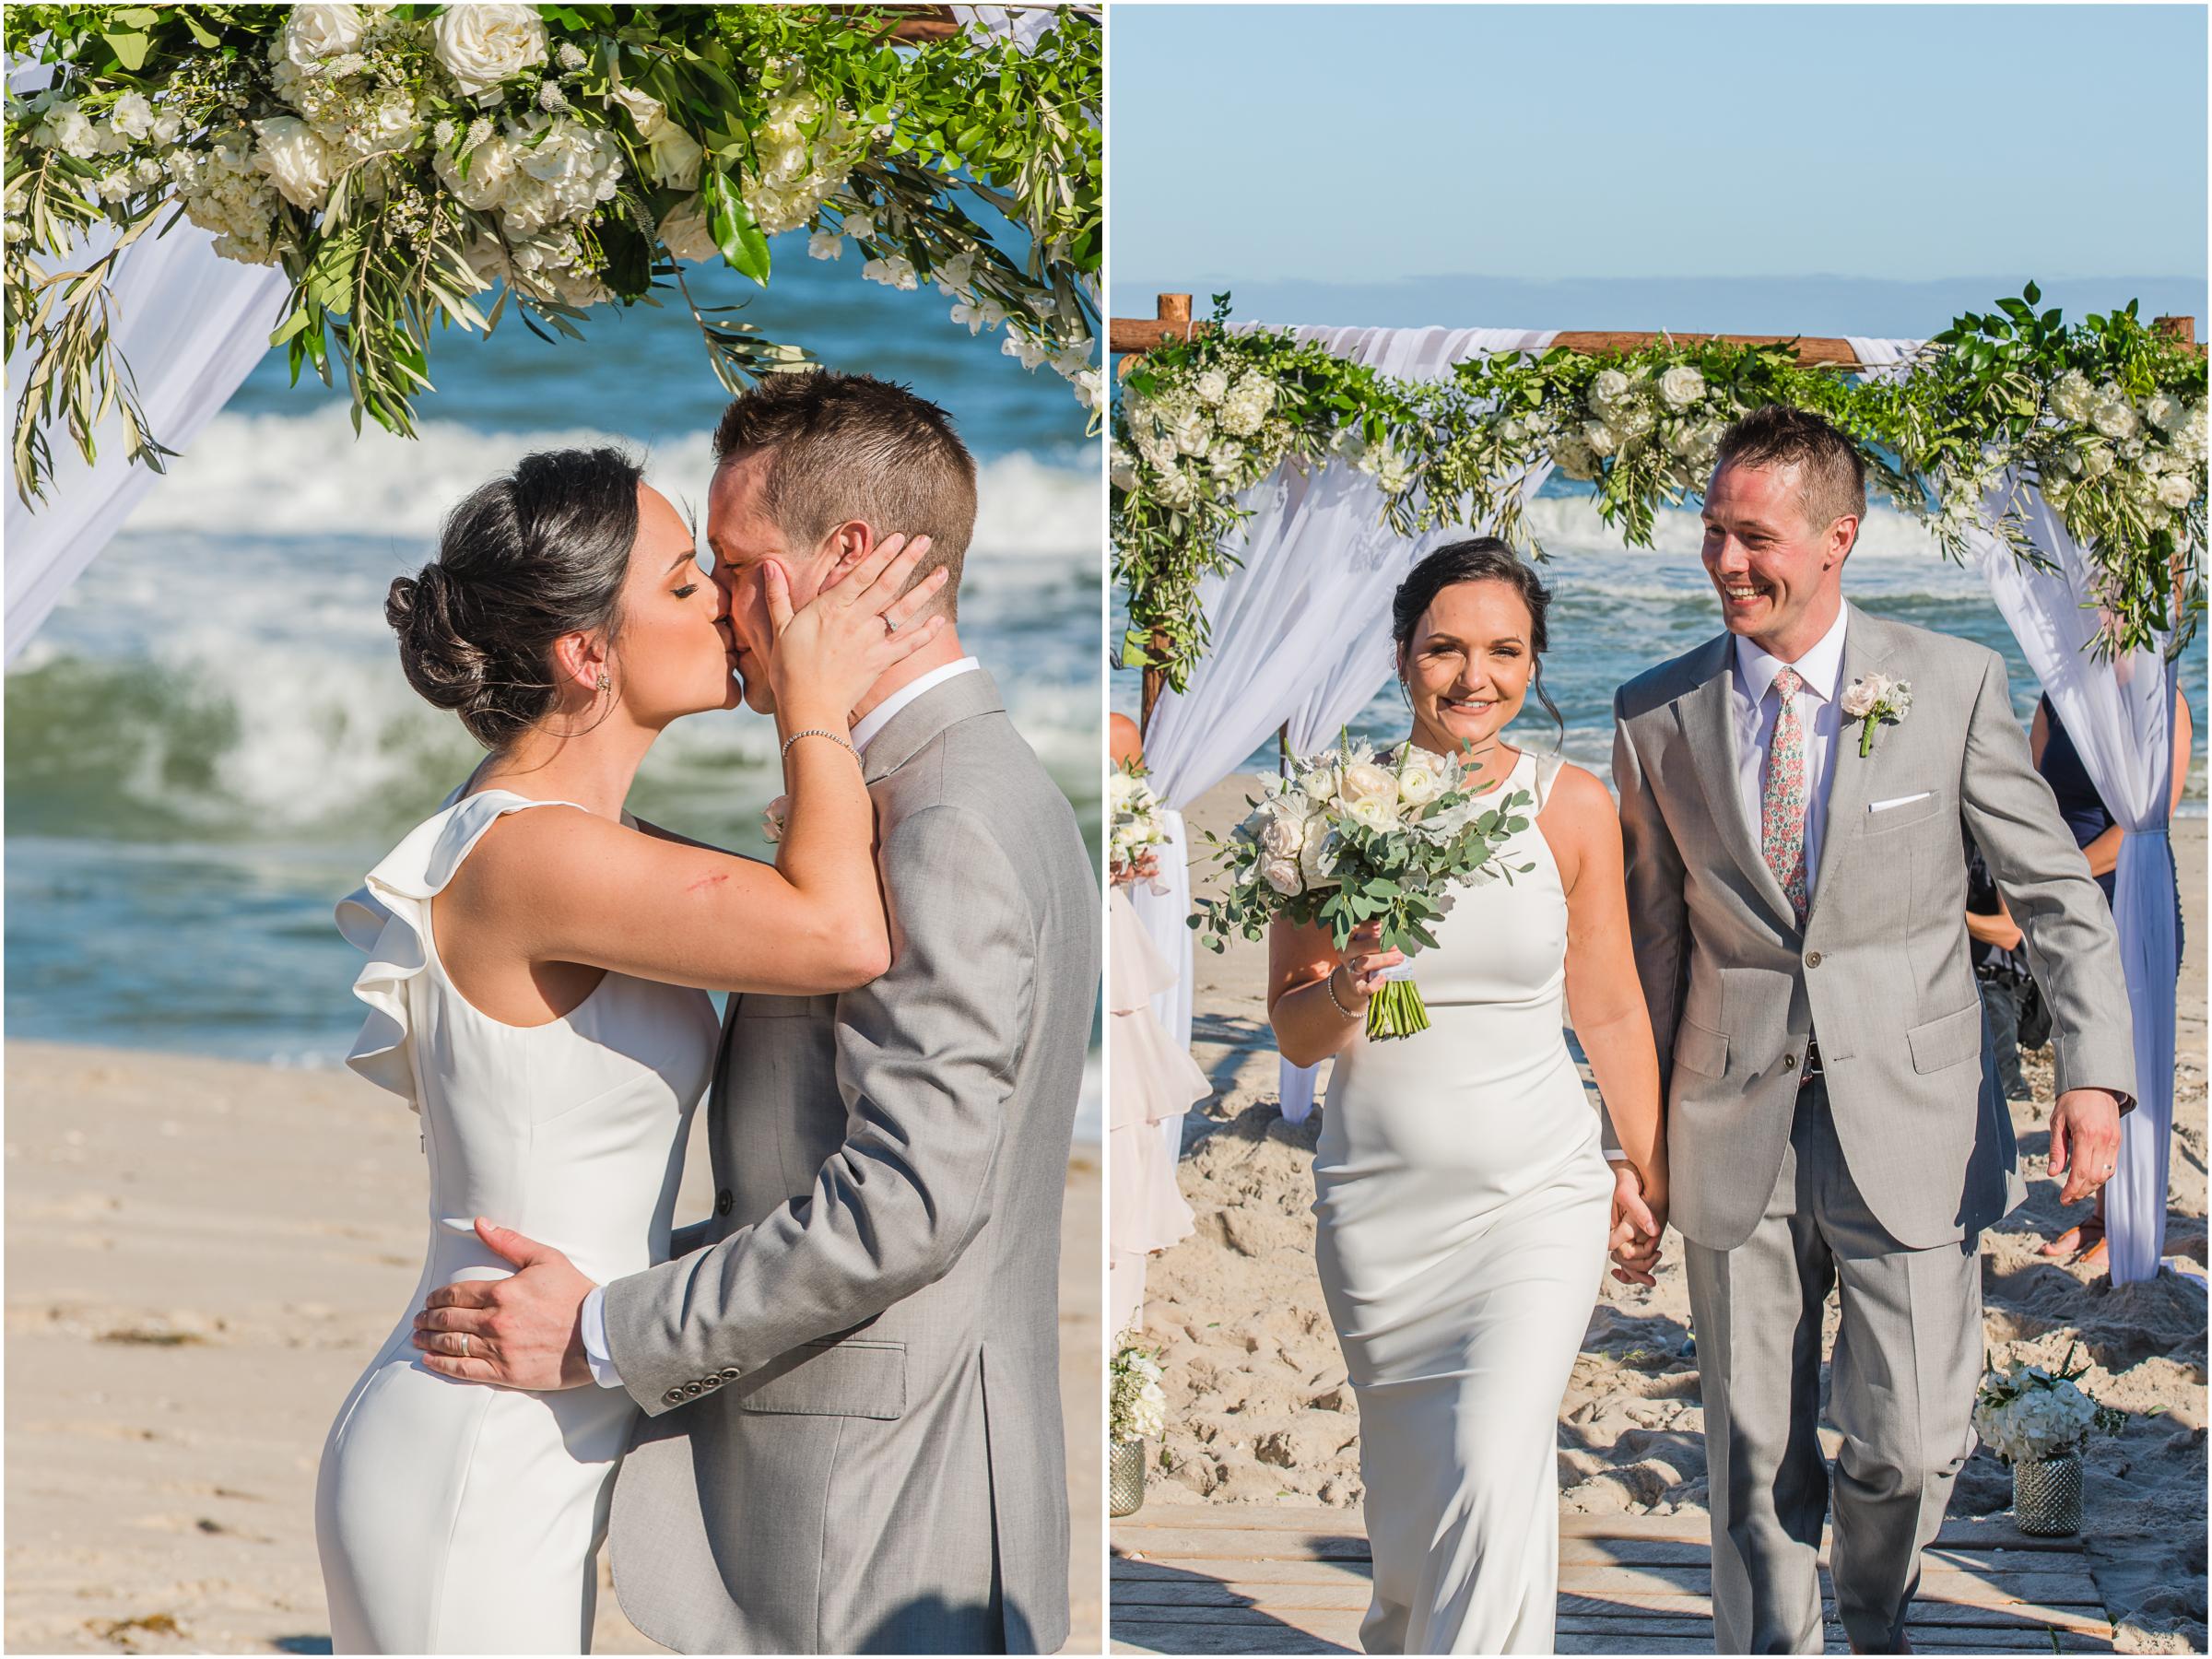 lbi-wedding-arts-foundation-lbi-wedding-photographer-17.jpg